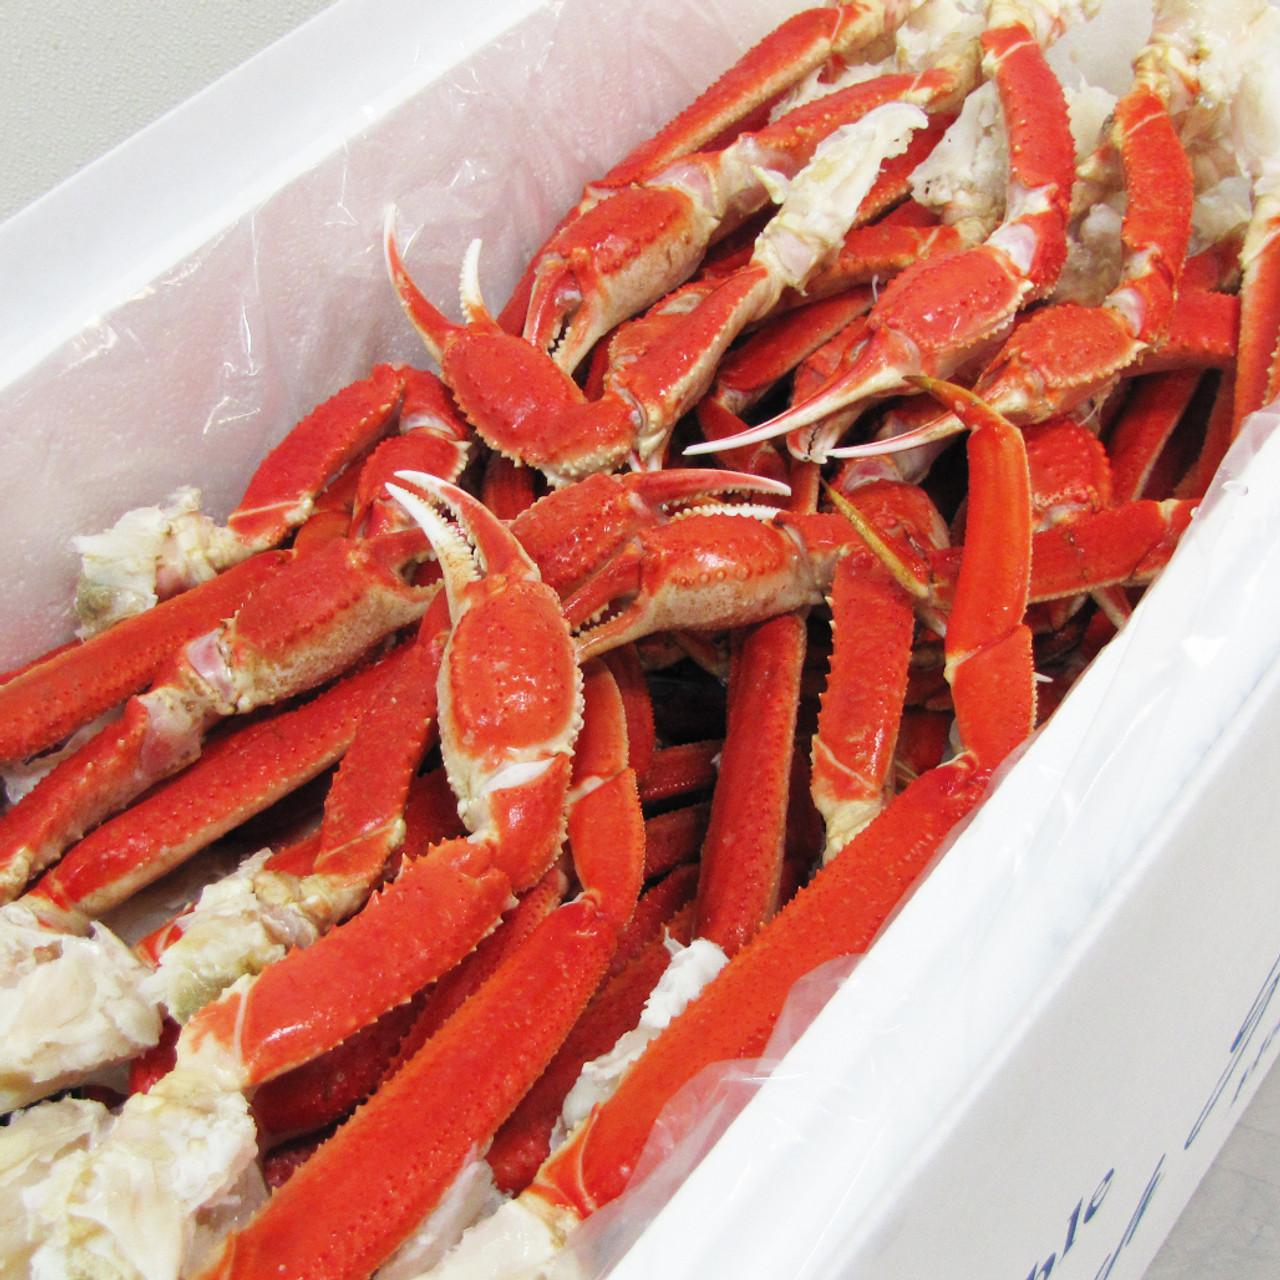 20 Lb Case Giant Alaska Snow Crab Bairdi Legs Claws Fishex Seafoods